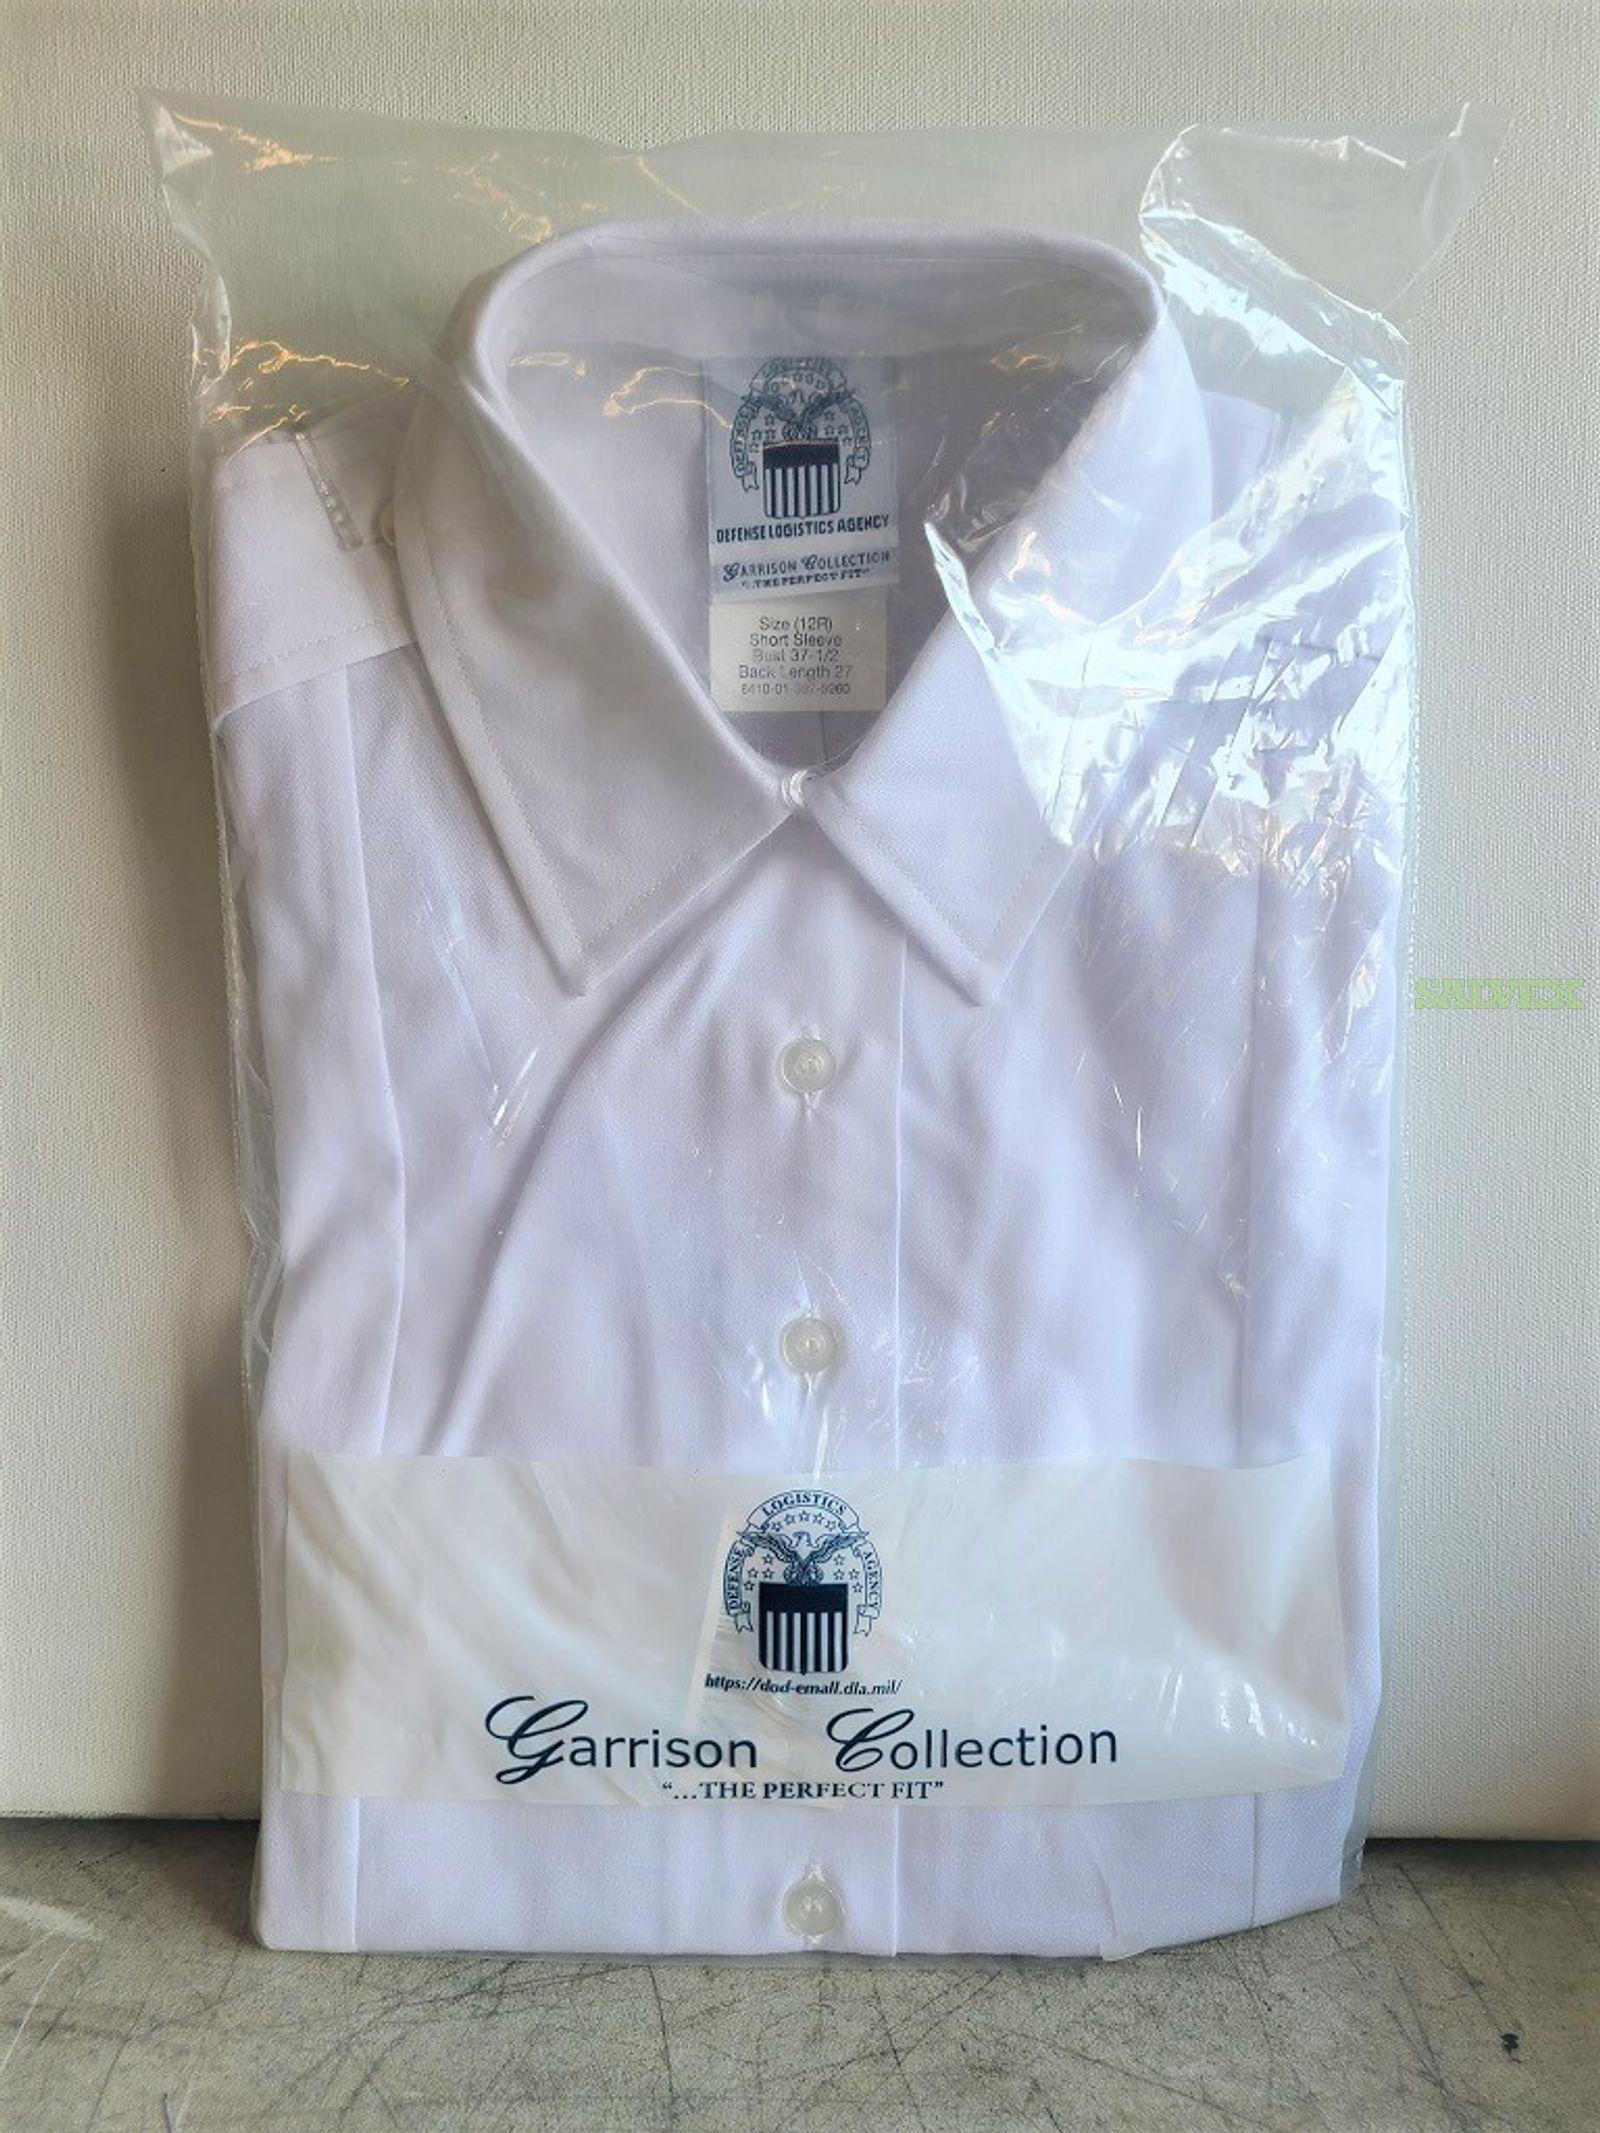 Defense Logistics Garrison Collection Short Sleeve White Women?s Dress Shirts- New (2250 Units)